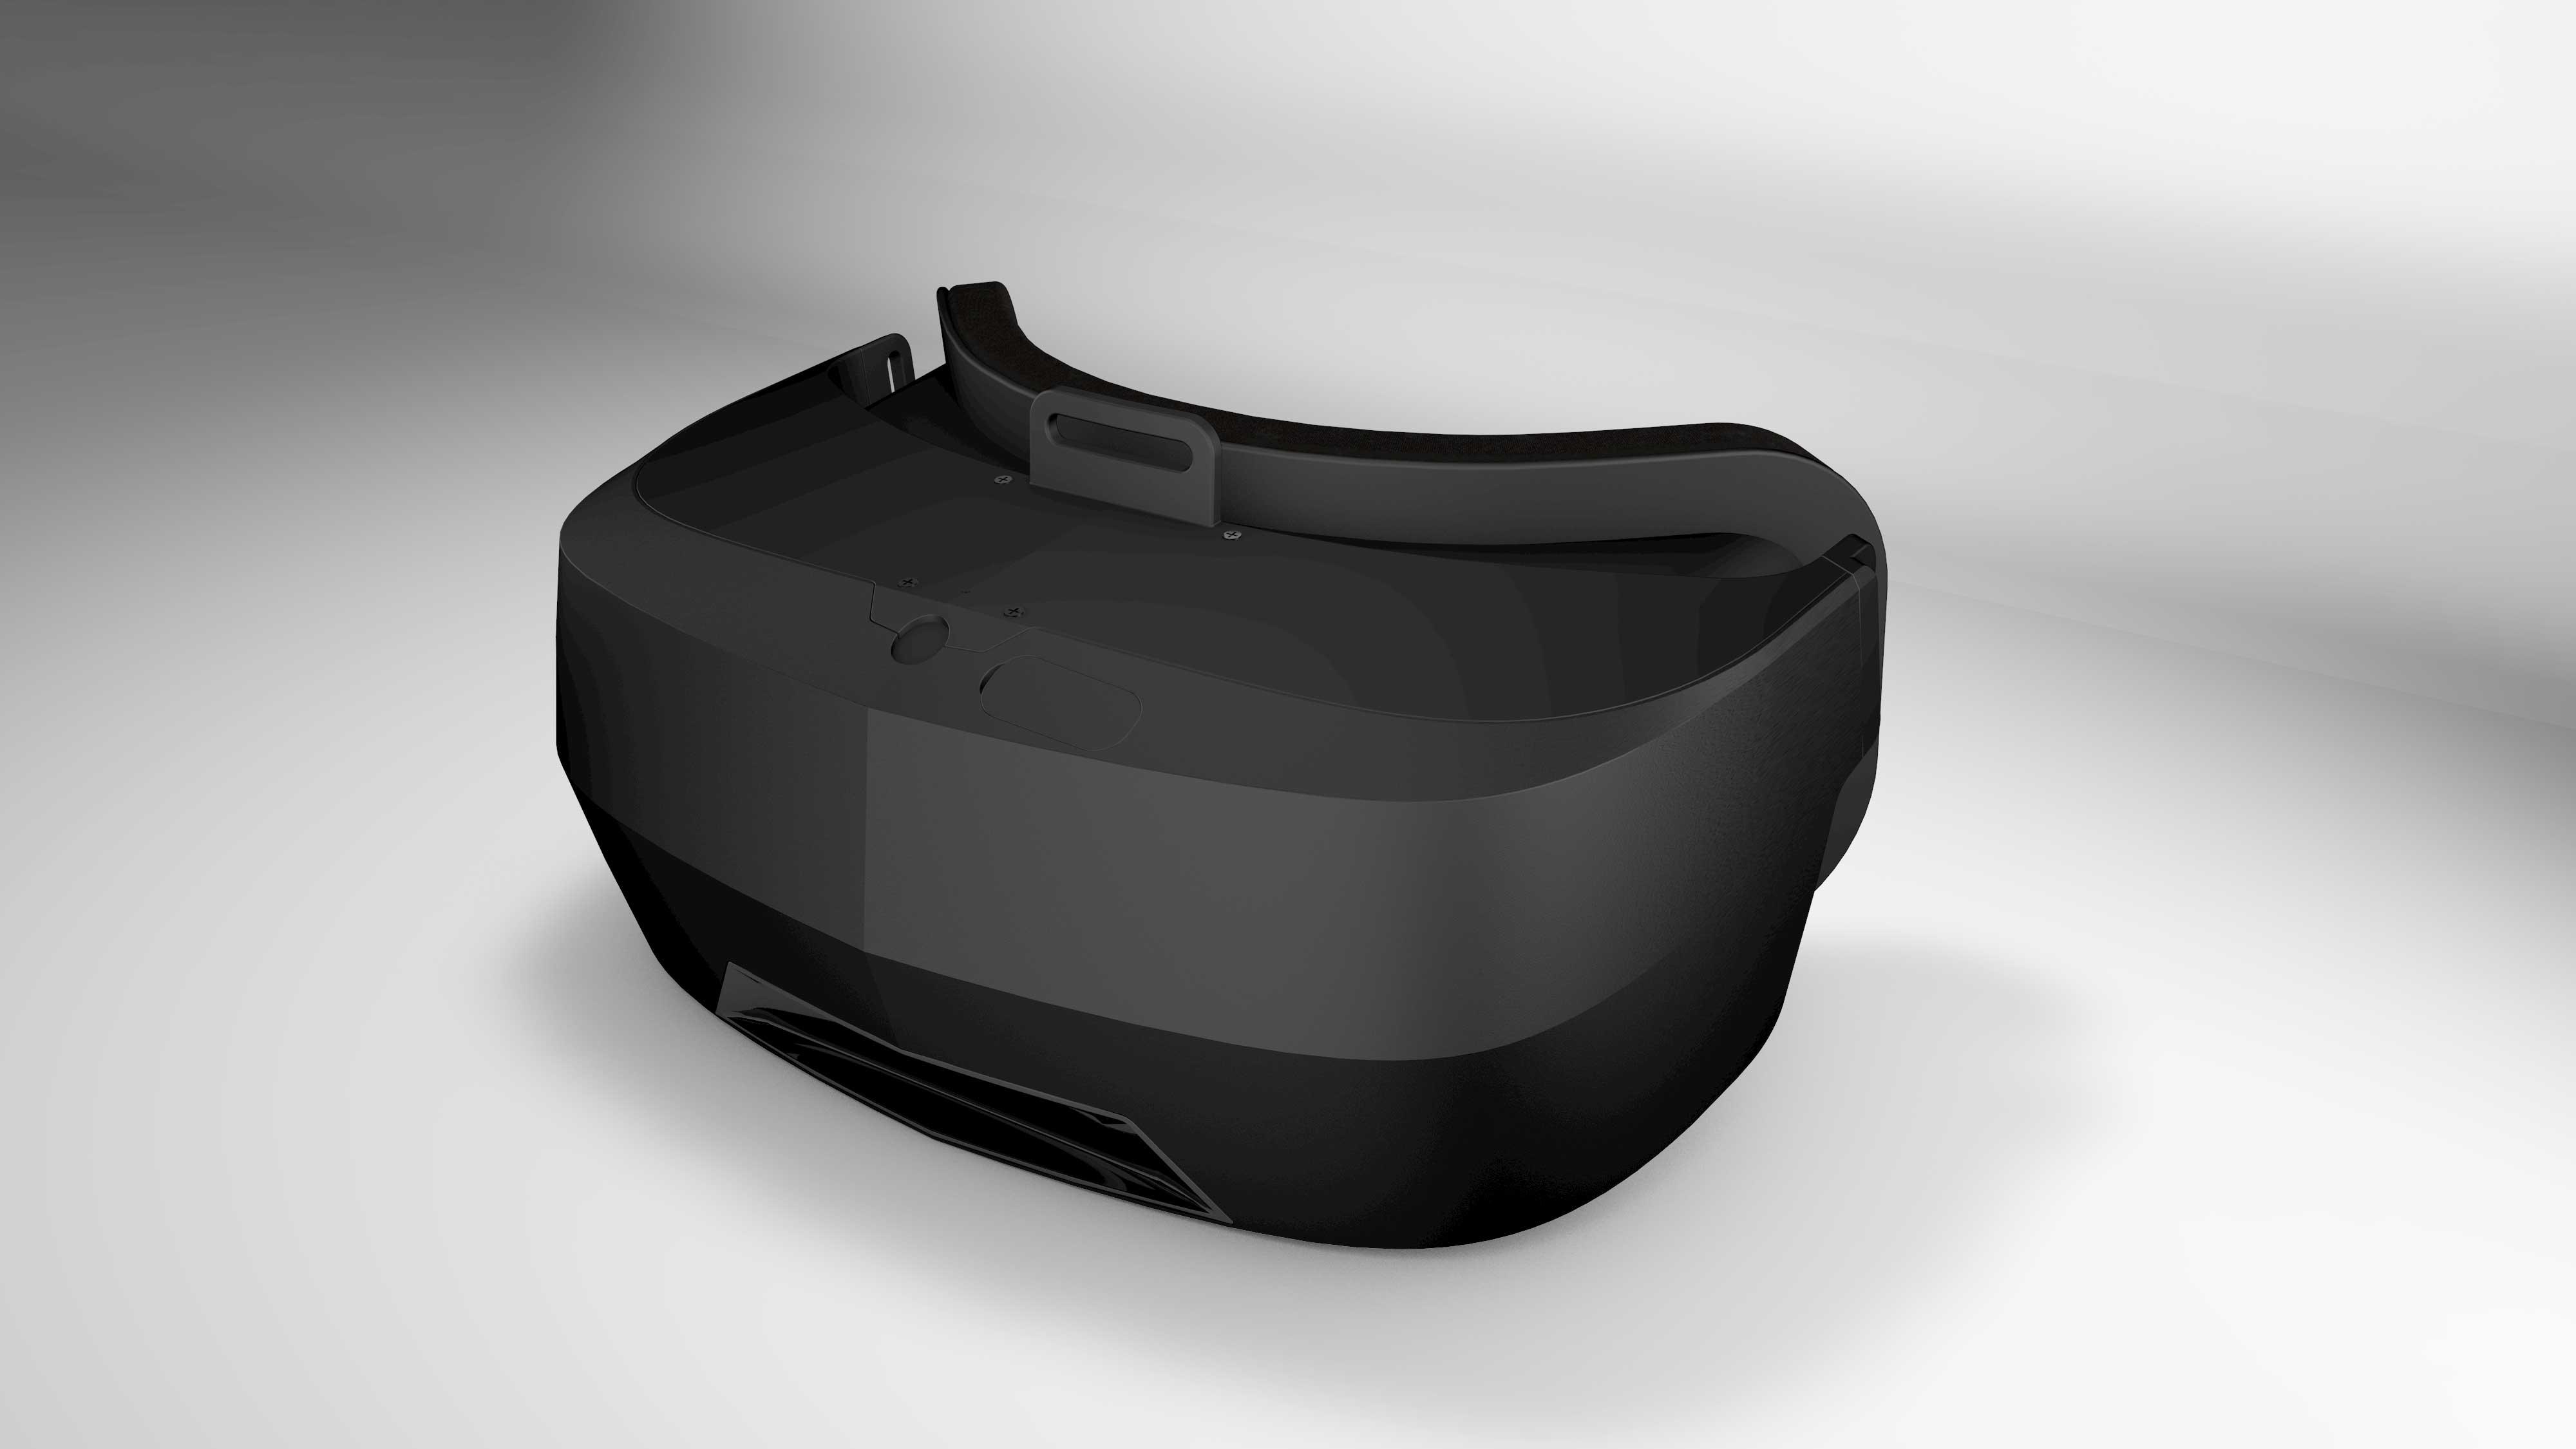 cdd641784e0f VR-Tek 2560x1440 Virtual Reality Headset w   20 Steam Gift Card ...